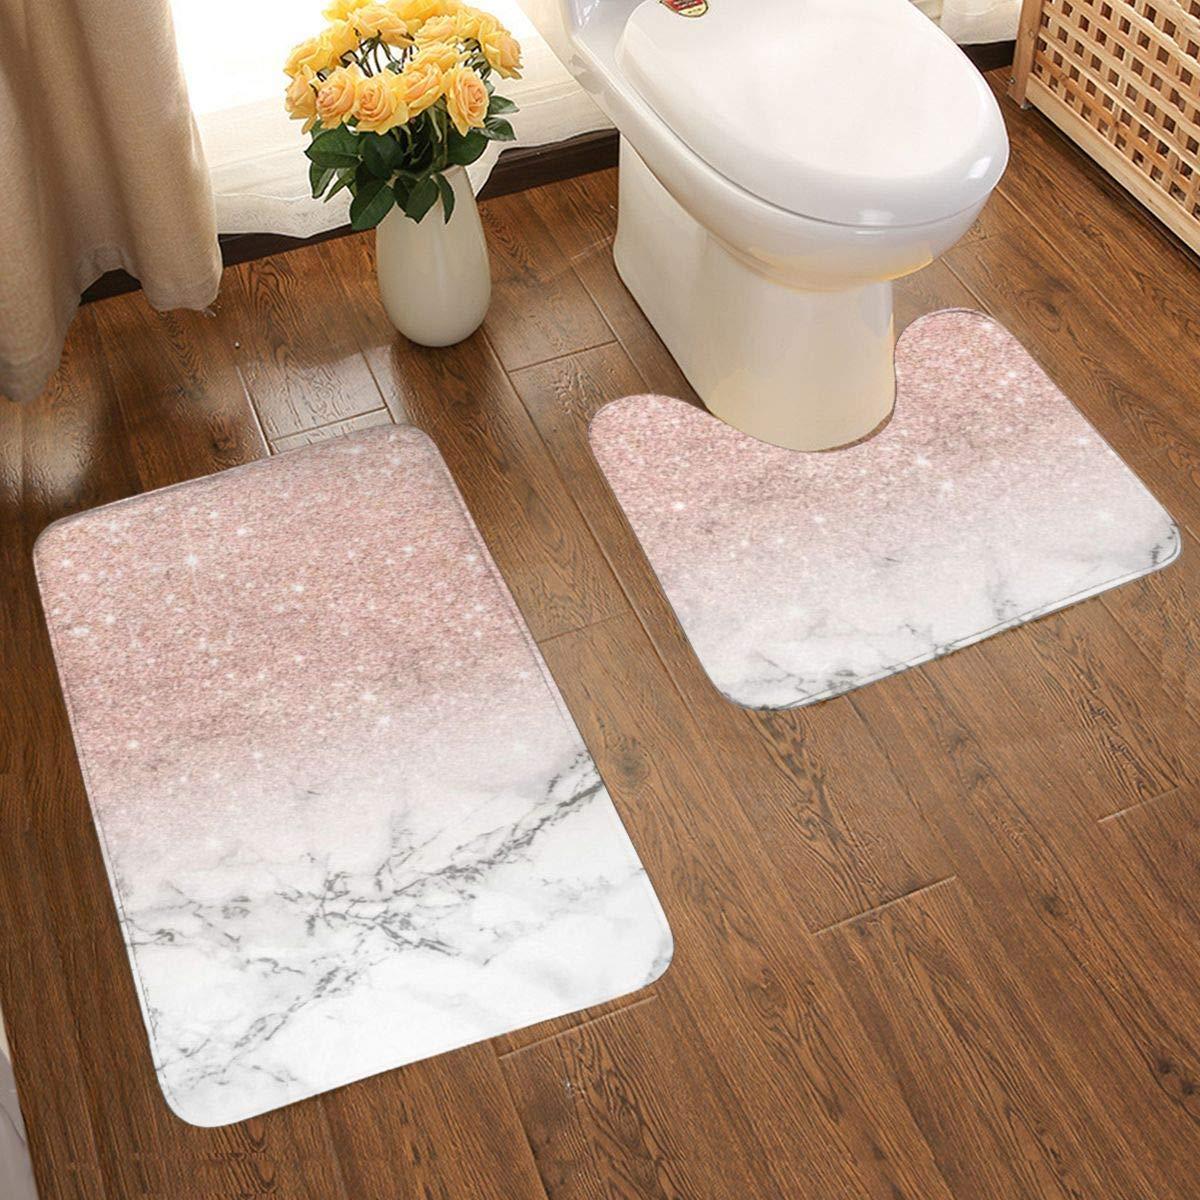 2 Piece Bathroom Rug Set Modern Rose Gold Pink Glitter White Marble Bath Mat Set Soft Non Slip Bath Mat 80 x 50 cm and U-Shaped Toilet Floor Rug Water Absorbent Door Mat